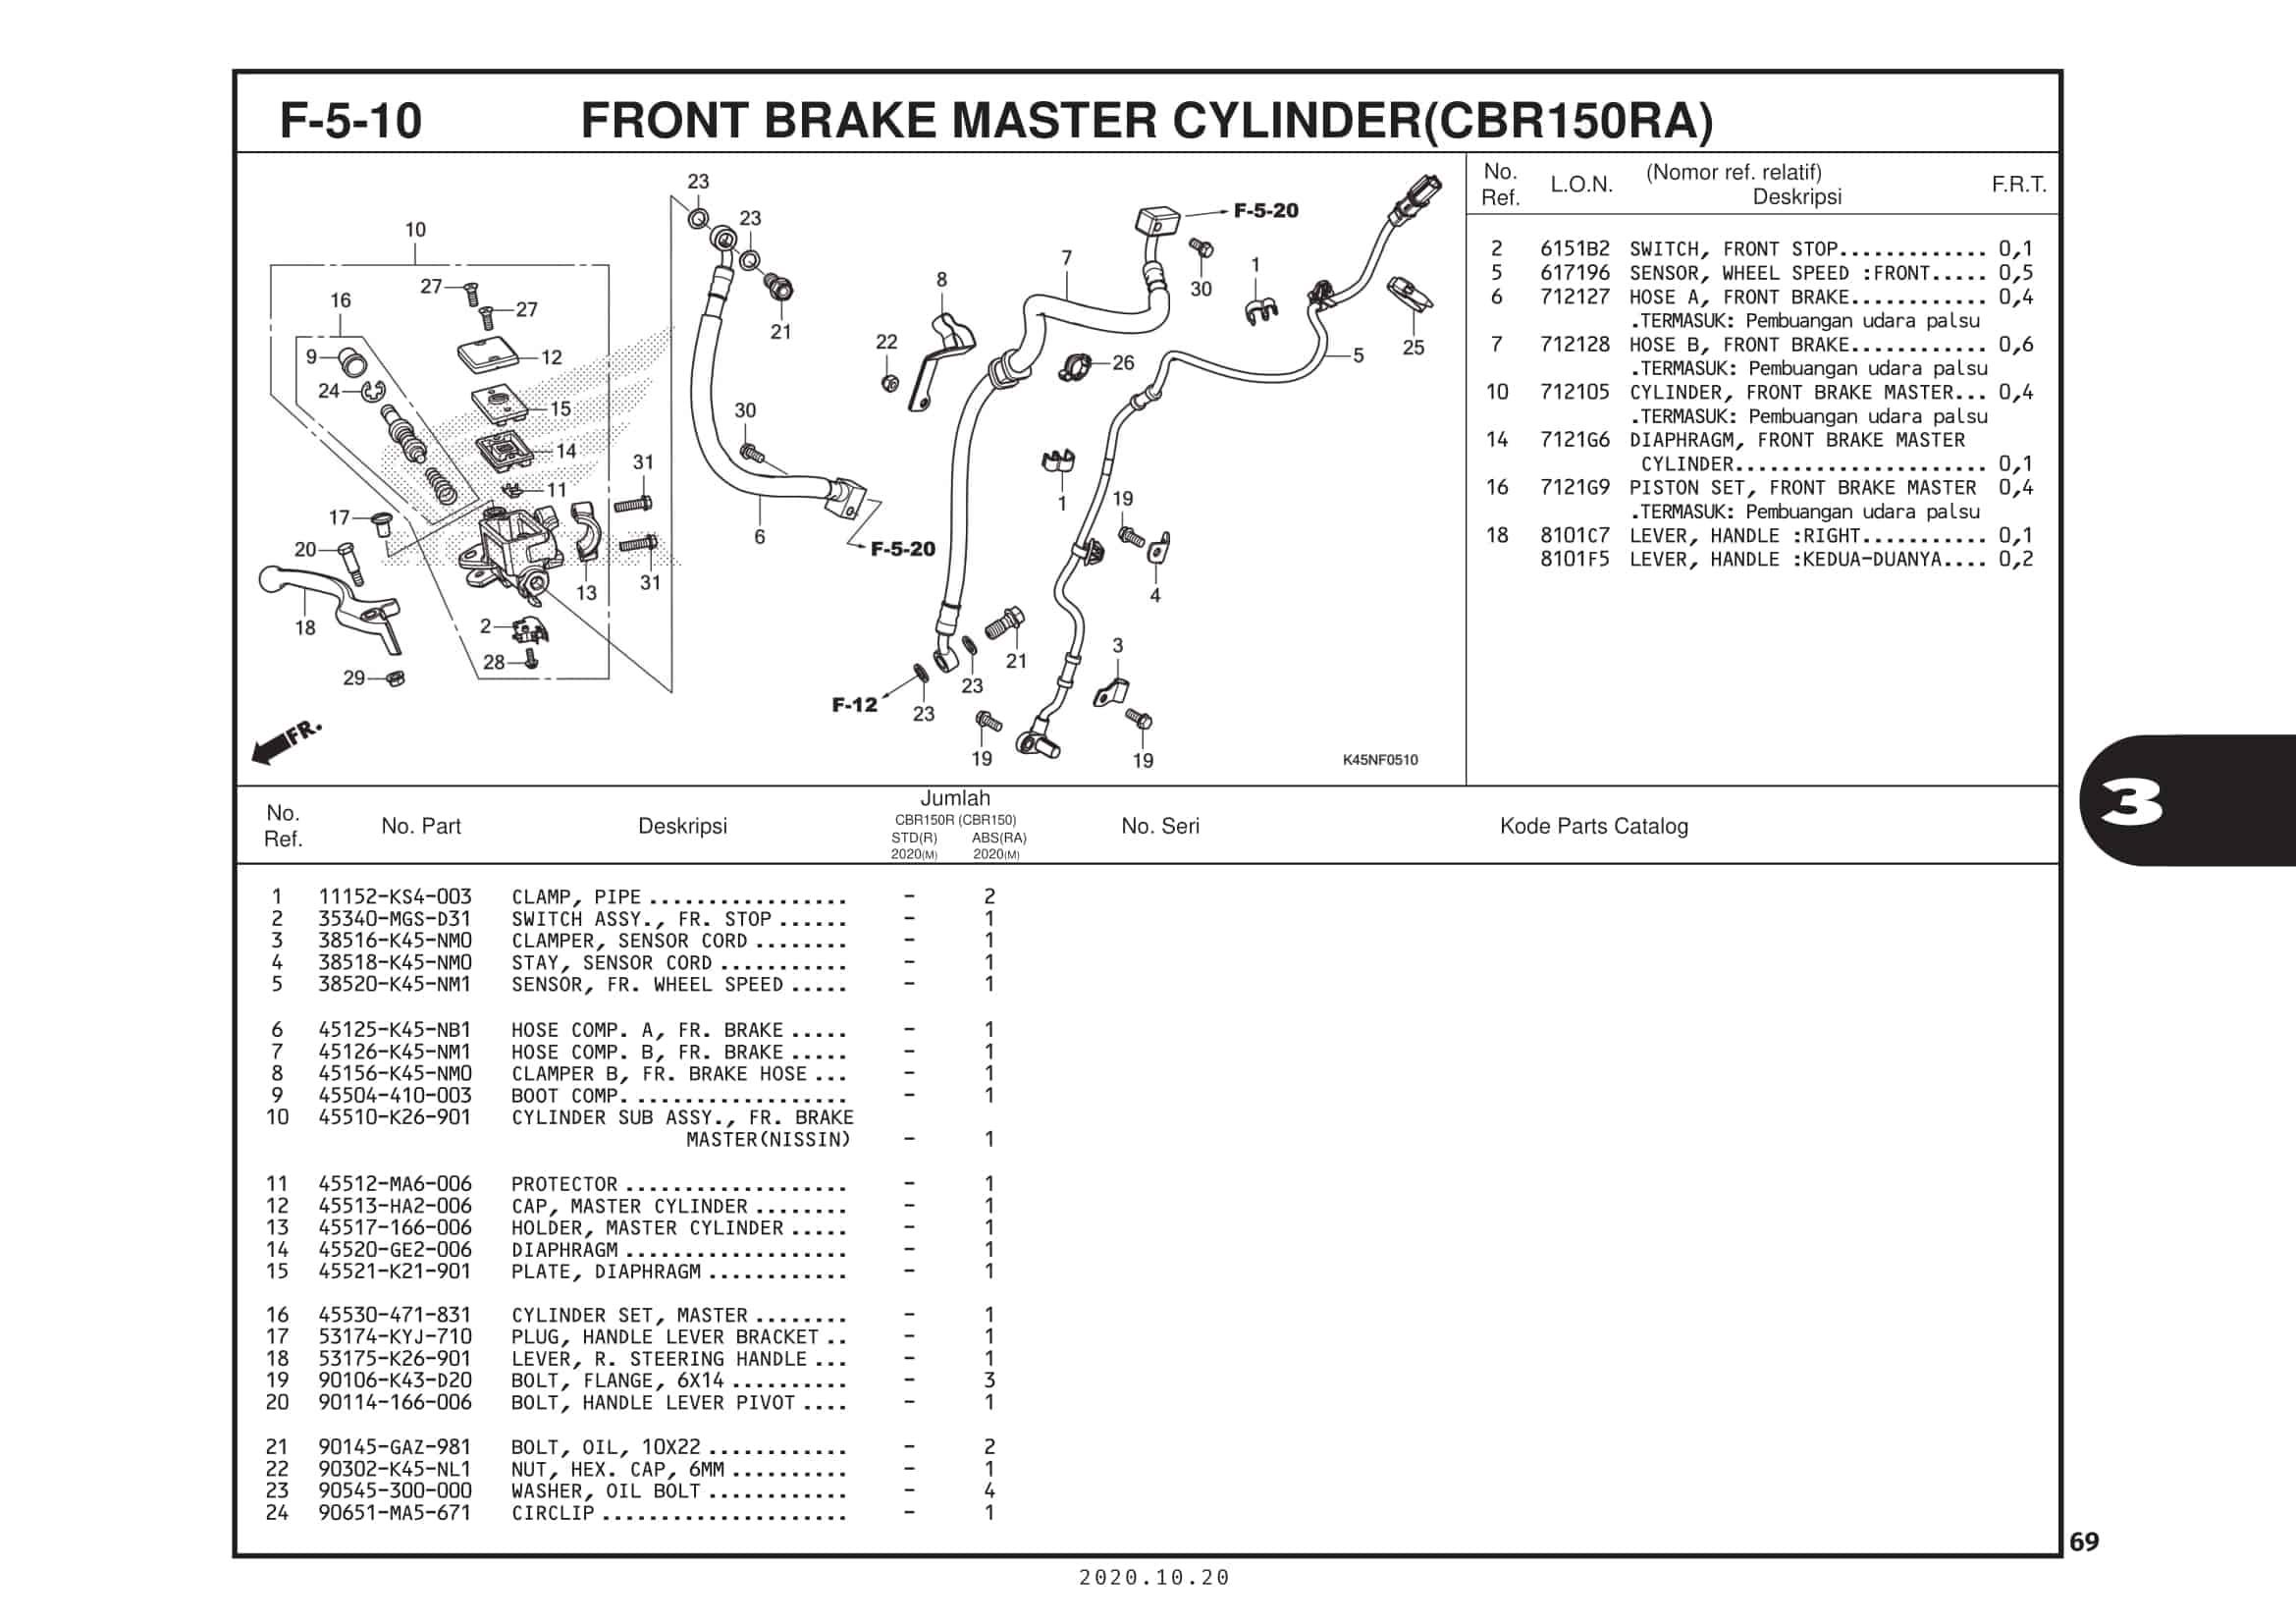 F-5-10 Front Brake Master Cylinder (CBR150RA)